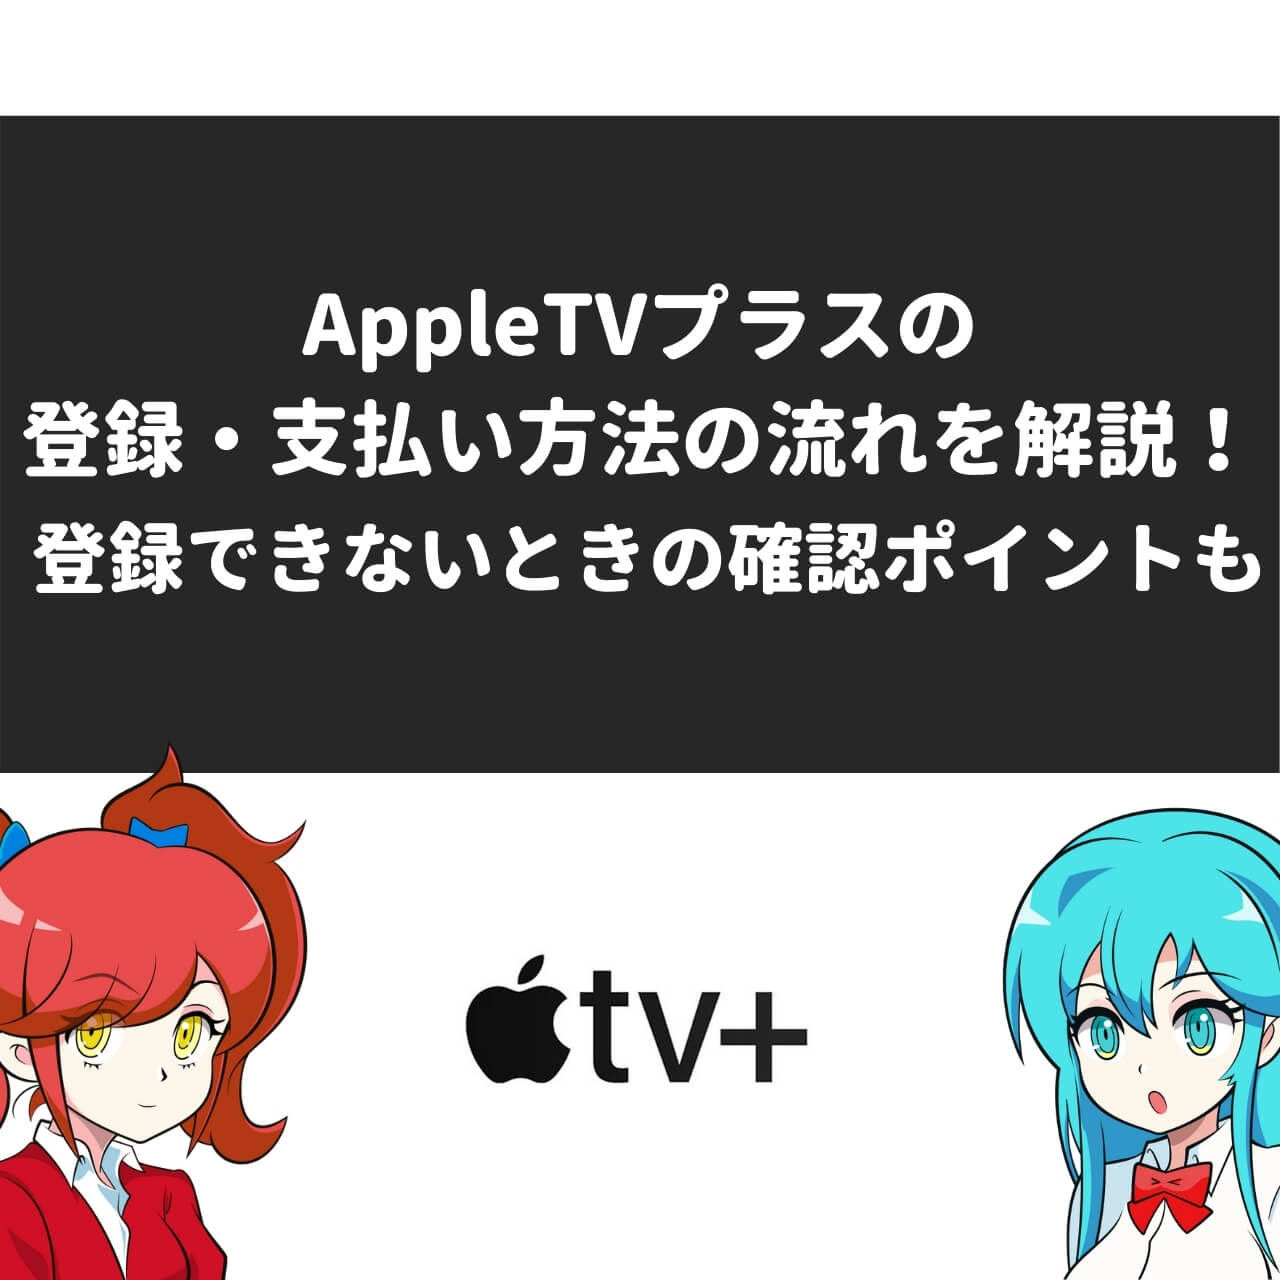 AppleTVプラスの登録・支払い方法の流れを解説!登録できないときの確認ポイントも